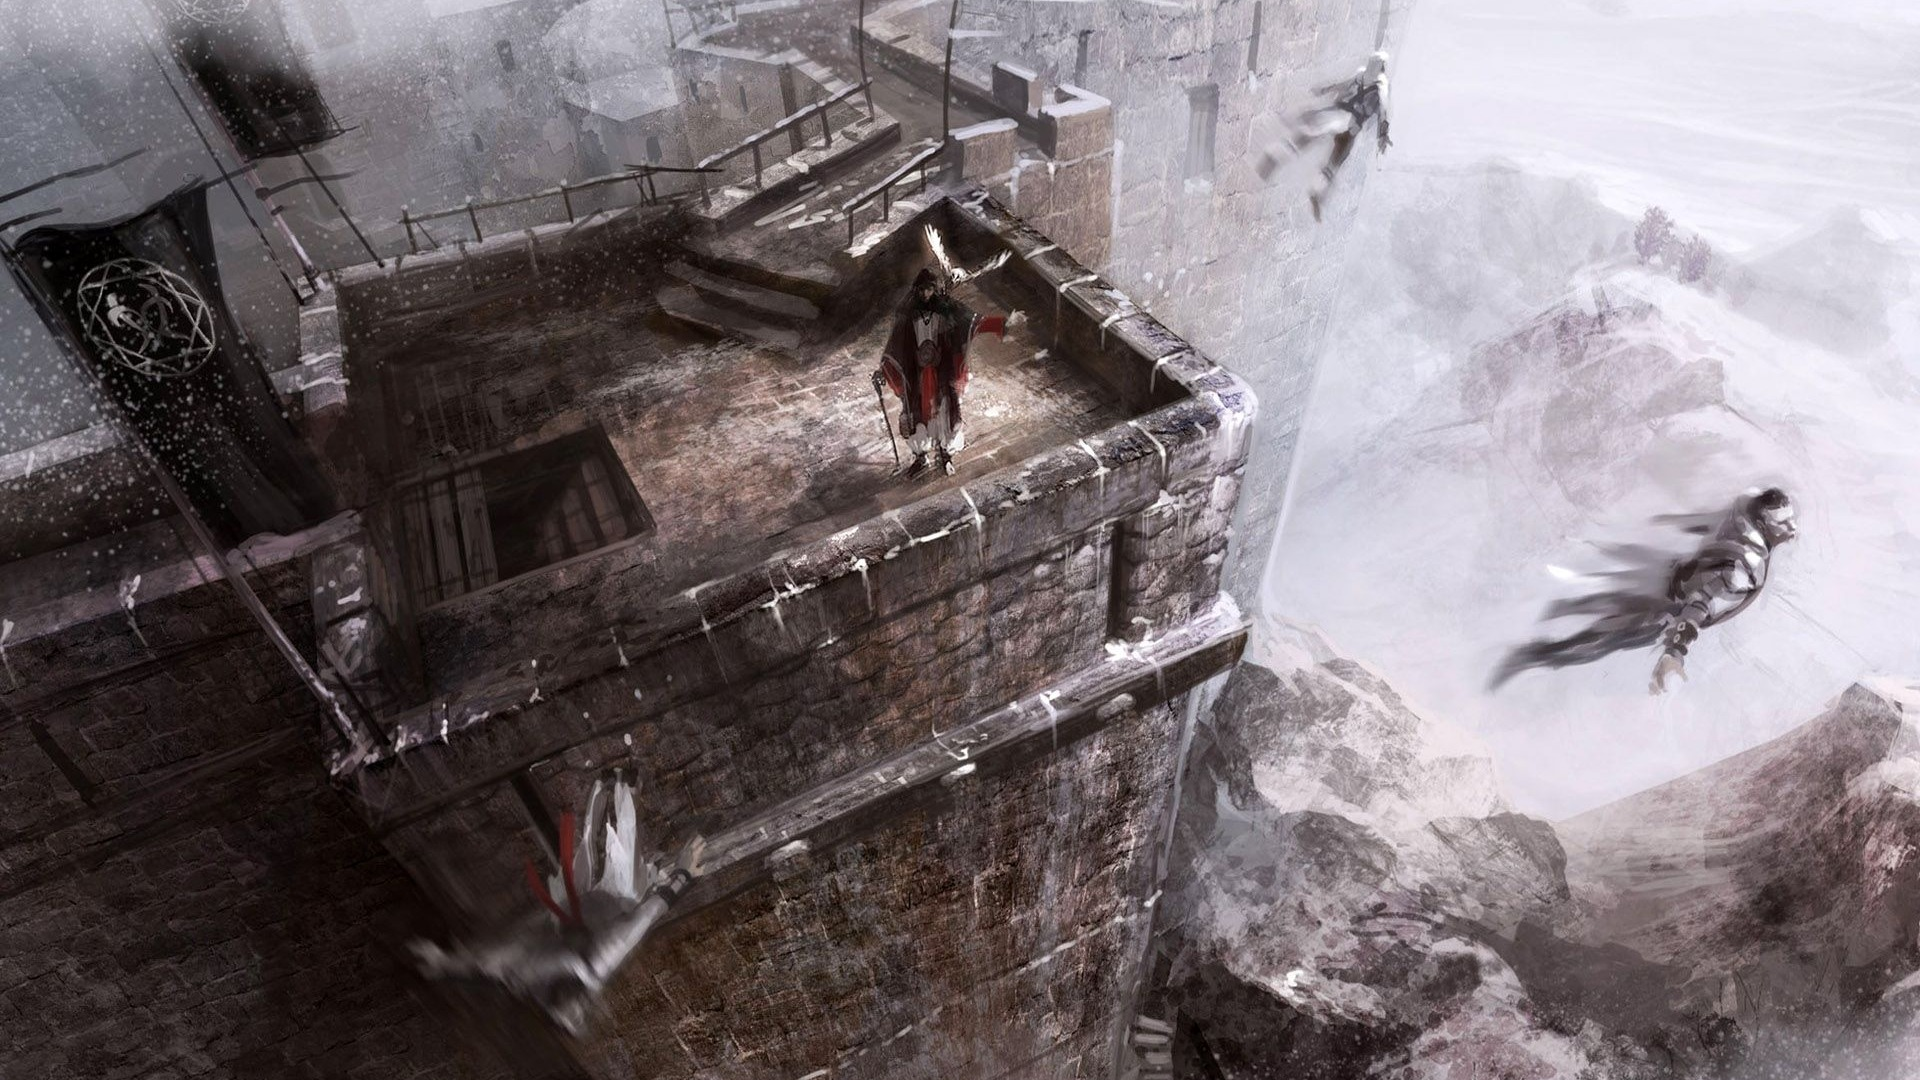 Assassins Creed Brotherhood HD Wallpaper 11  1920x1080